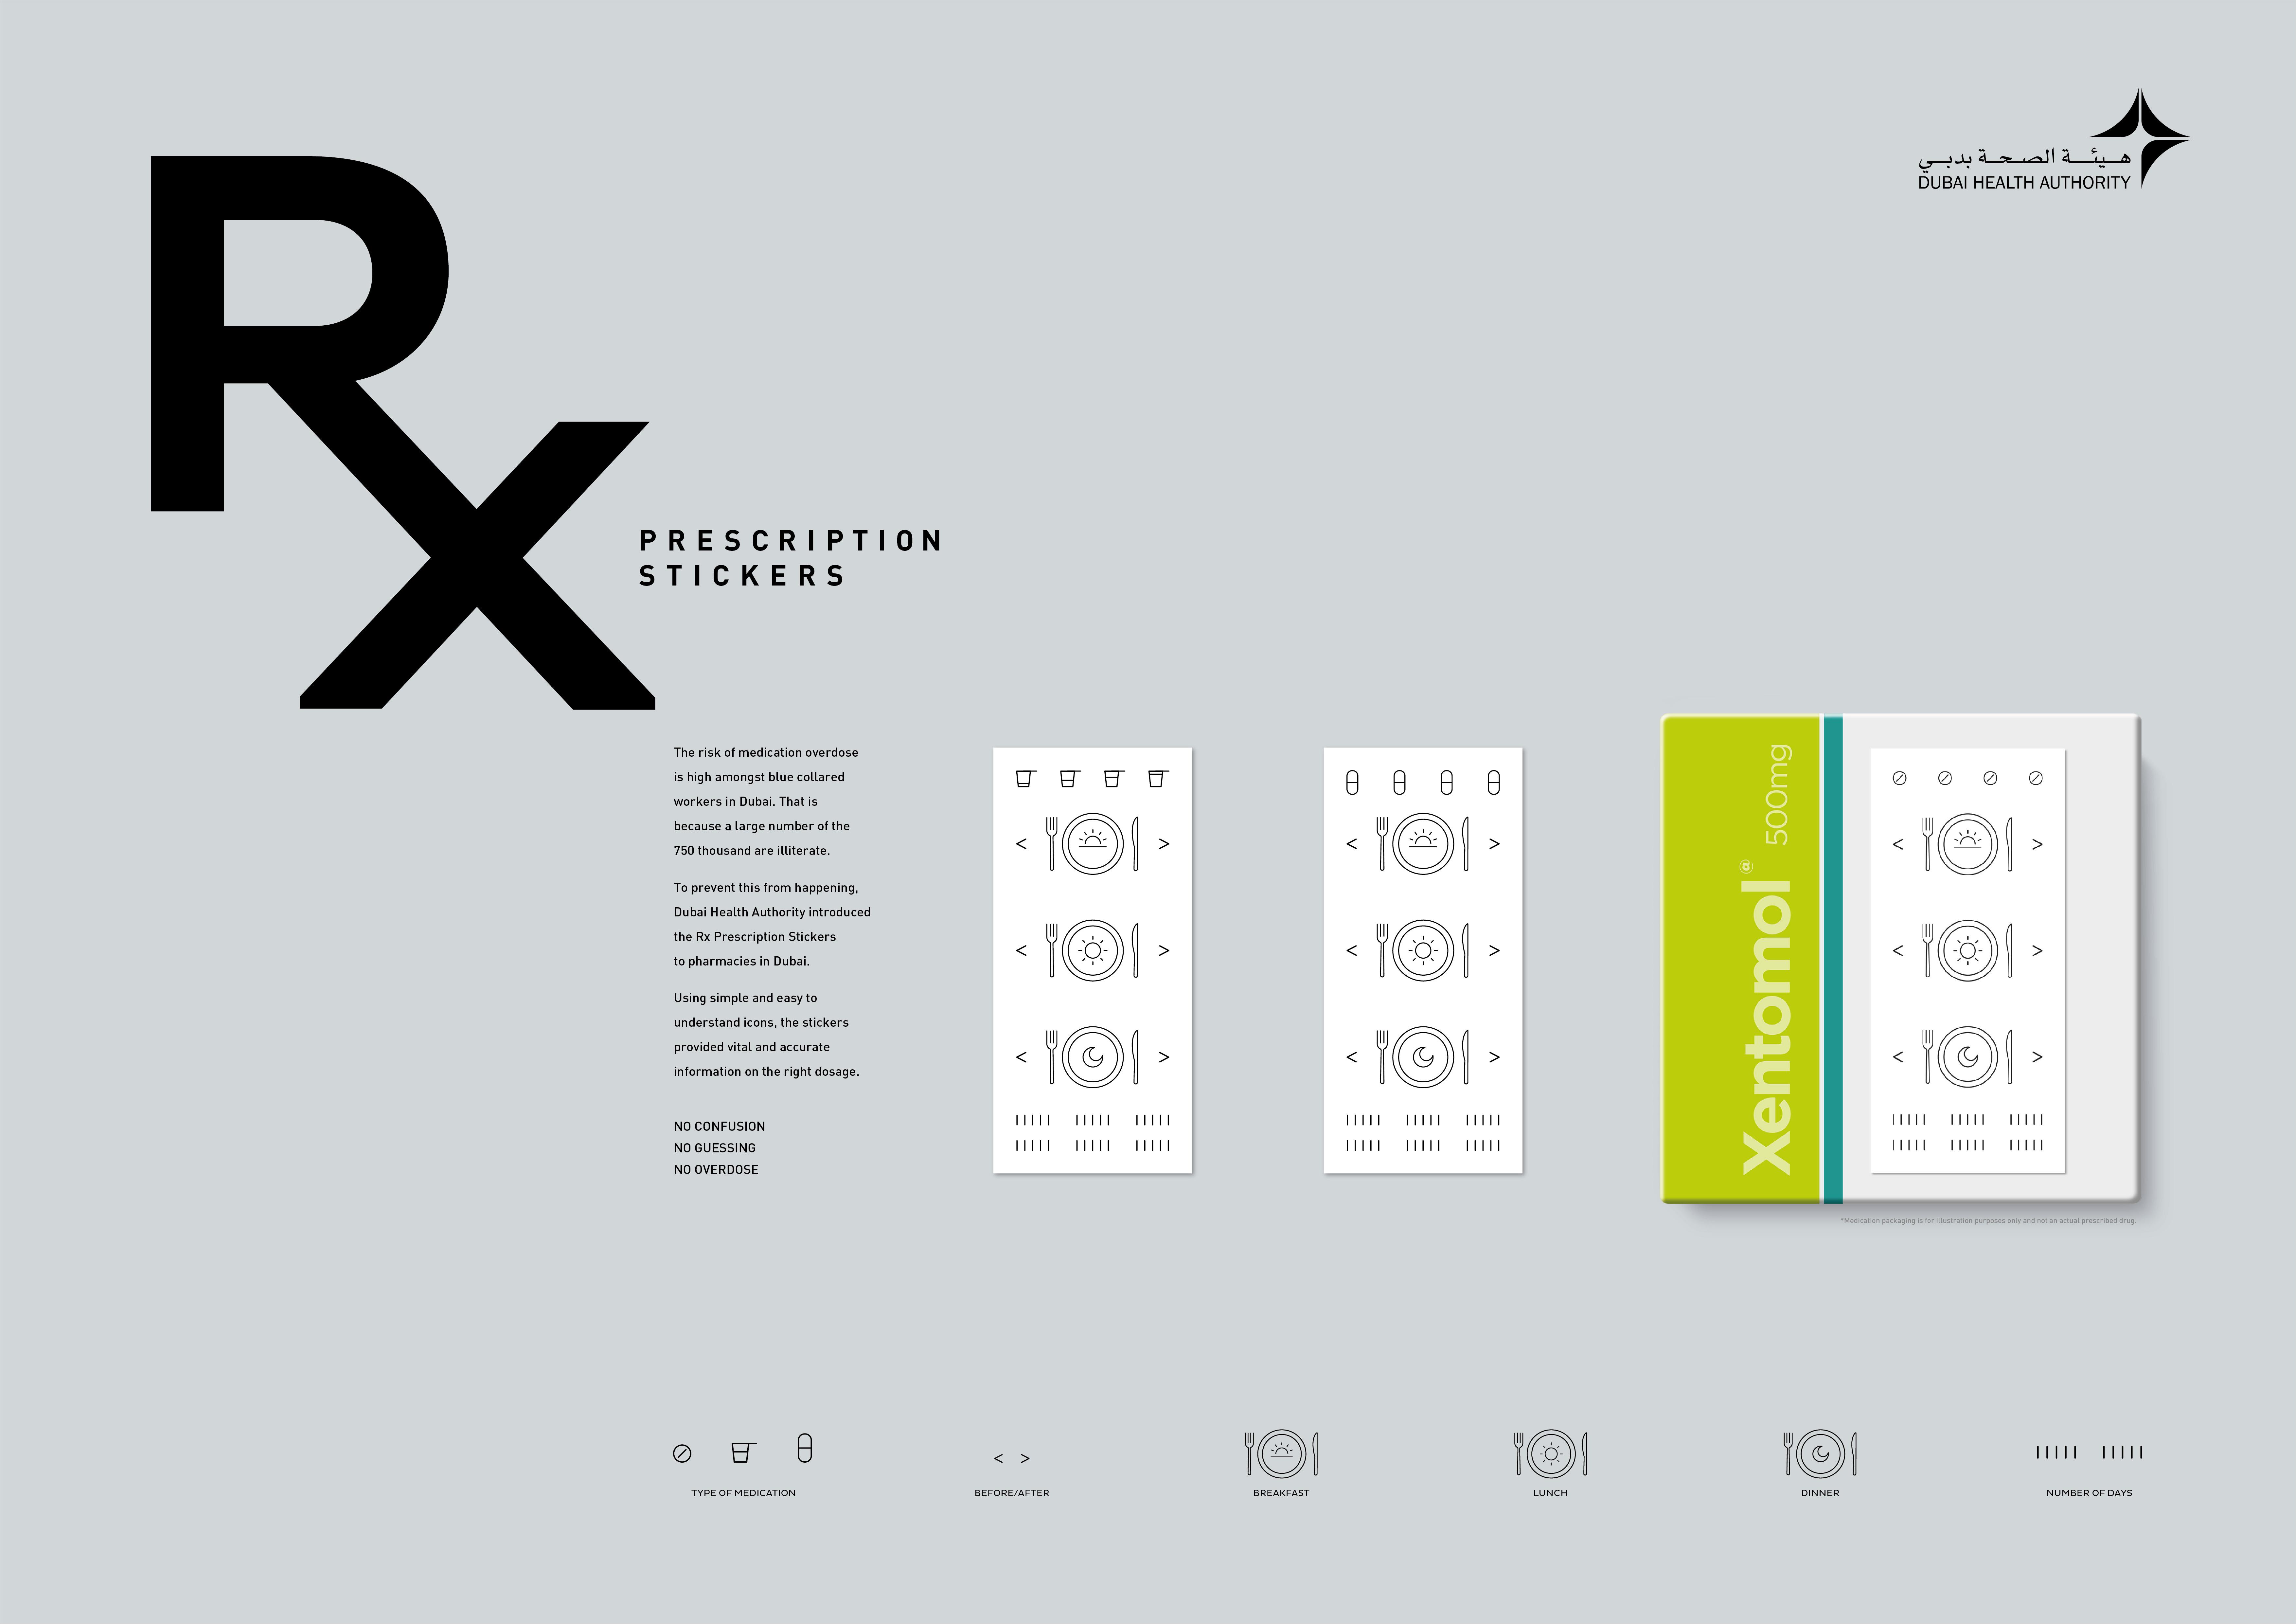 RX Prescription Stickers Thumbnail